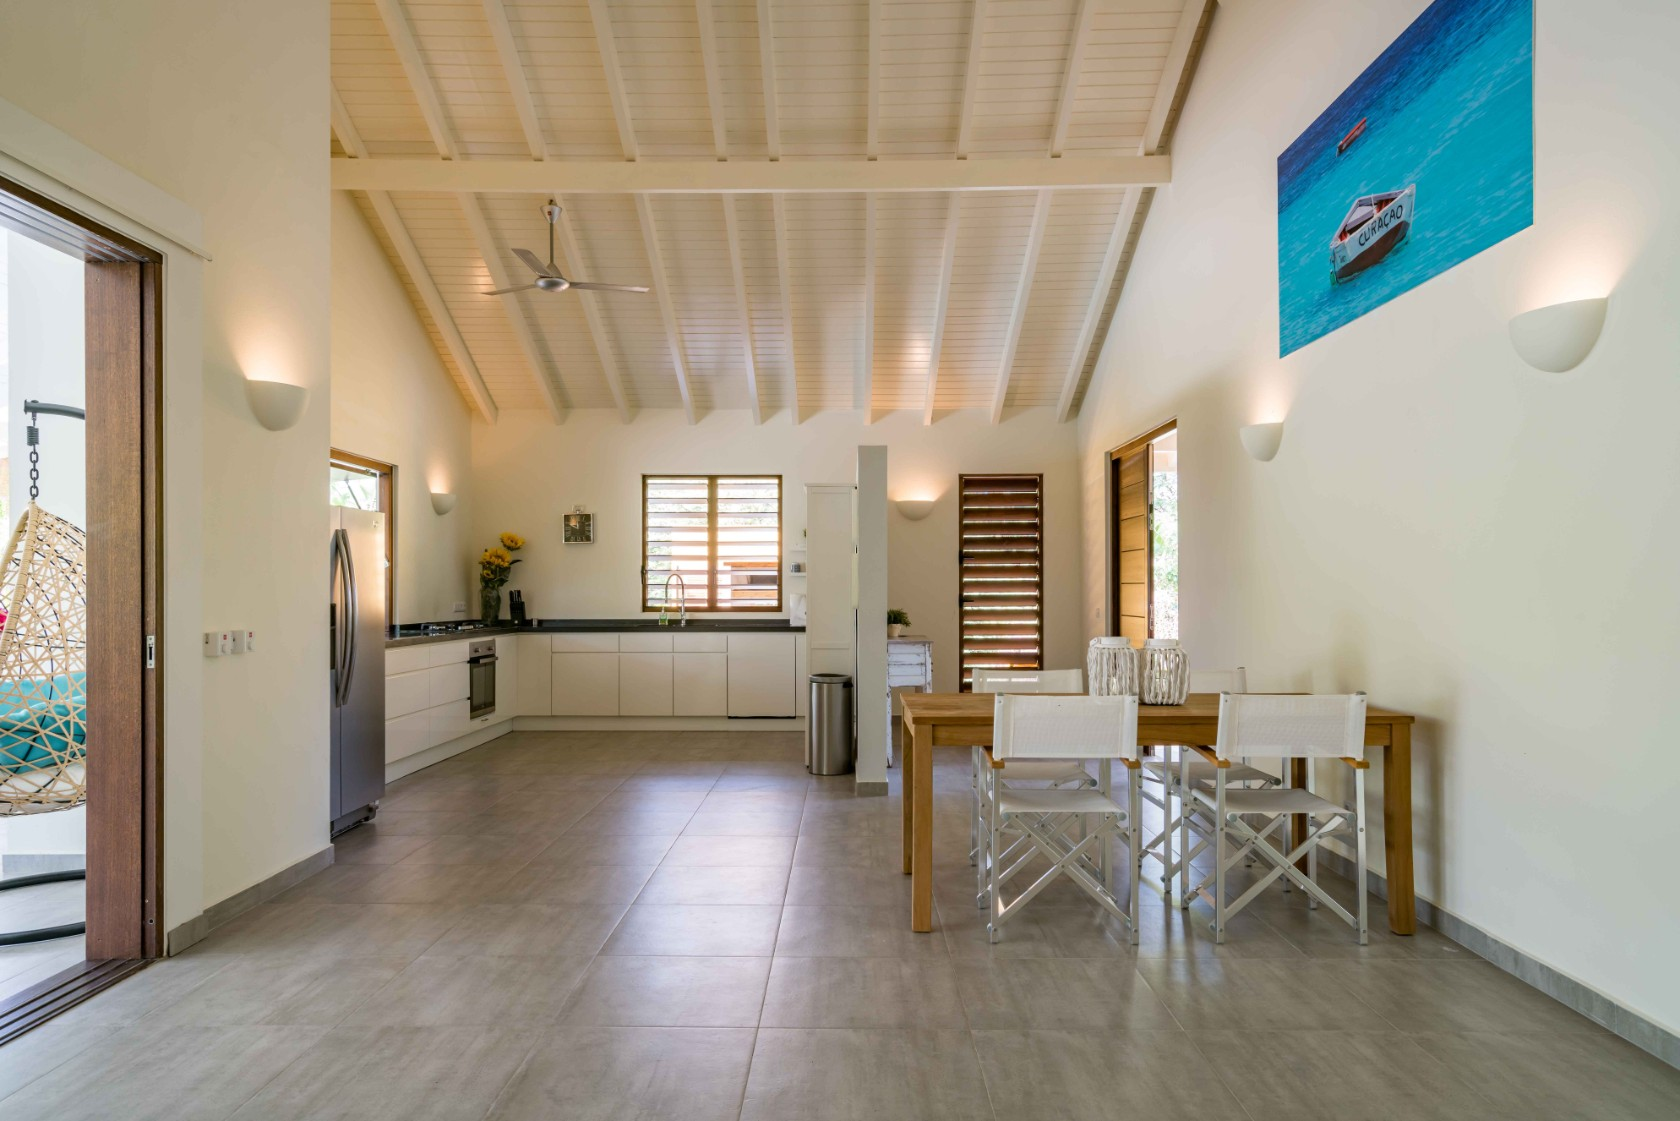 villa-flamingo-keuken